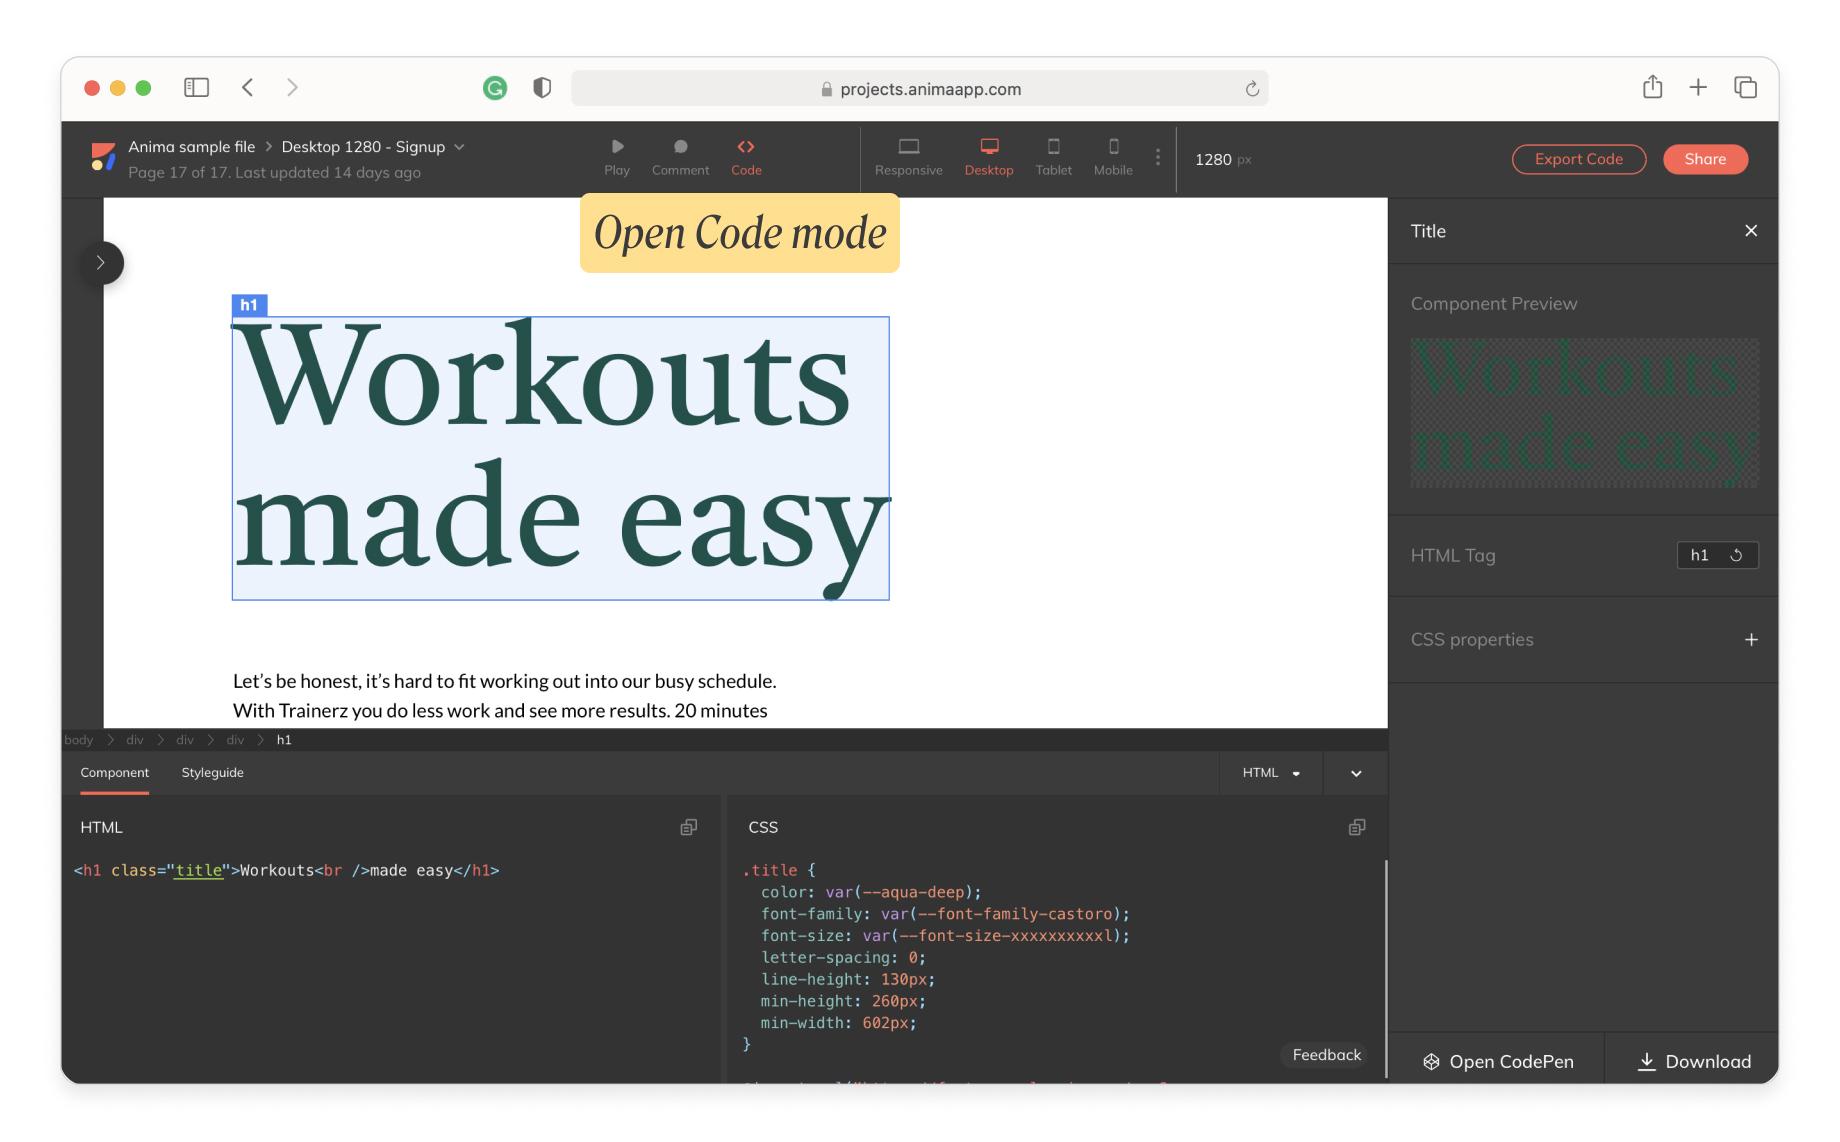 Open code mode in Anima